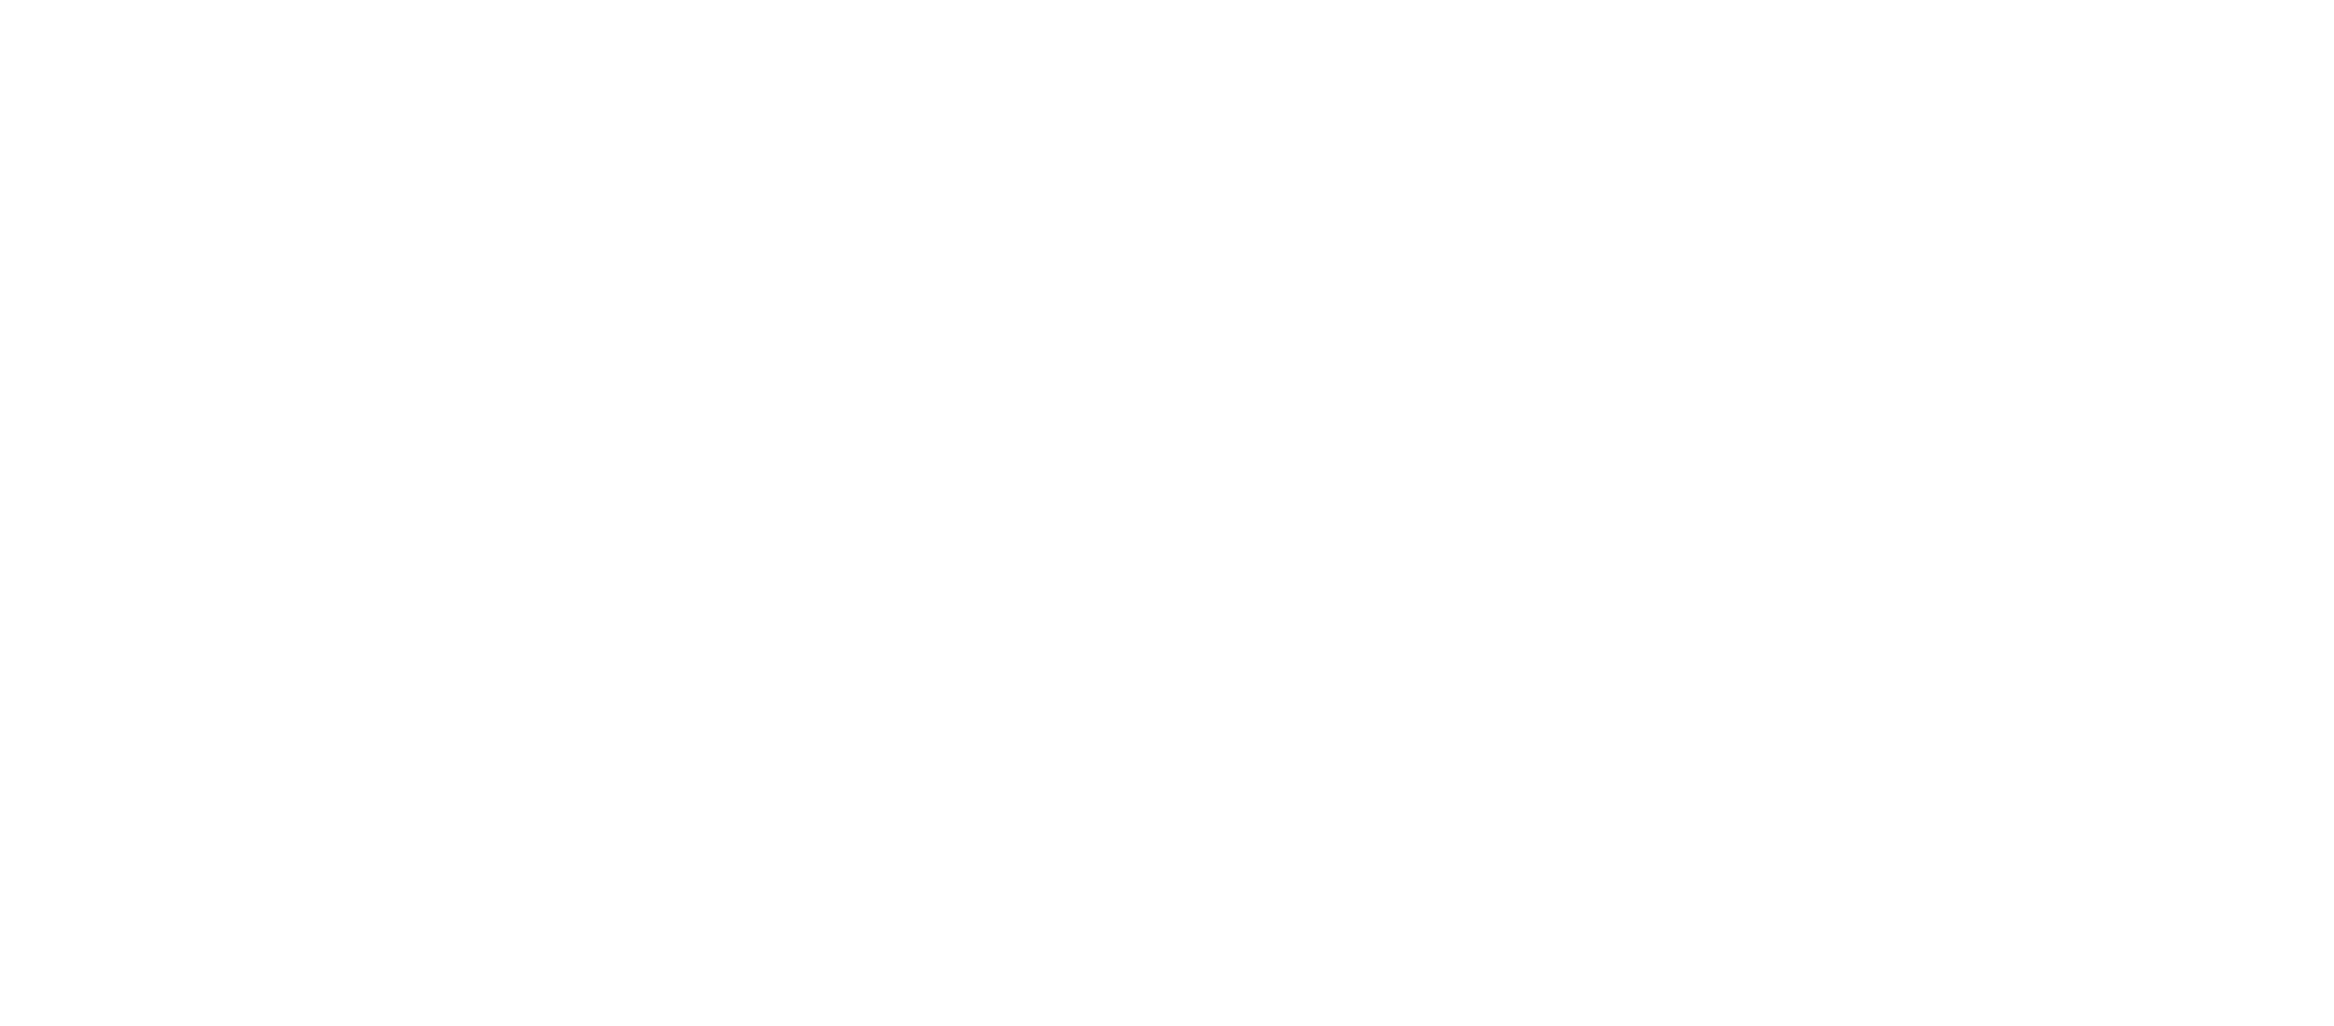 Screenings-01.png